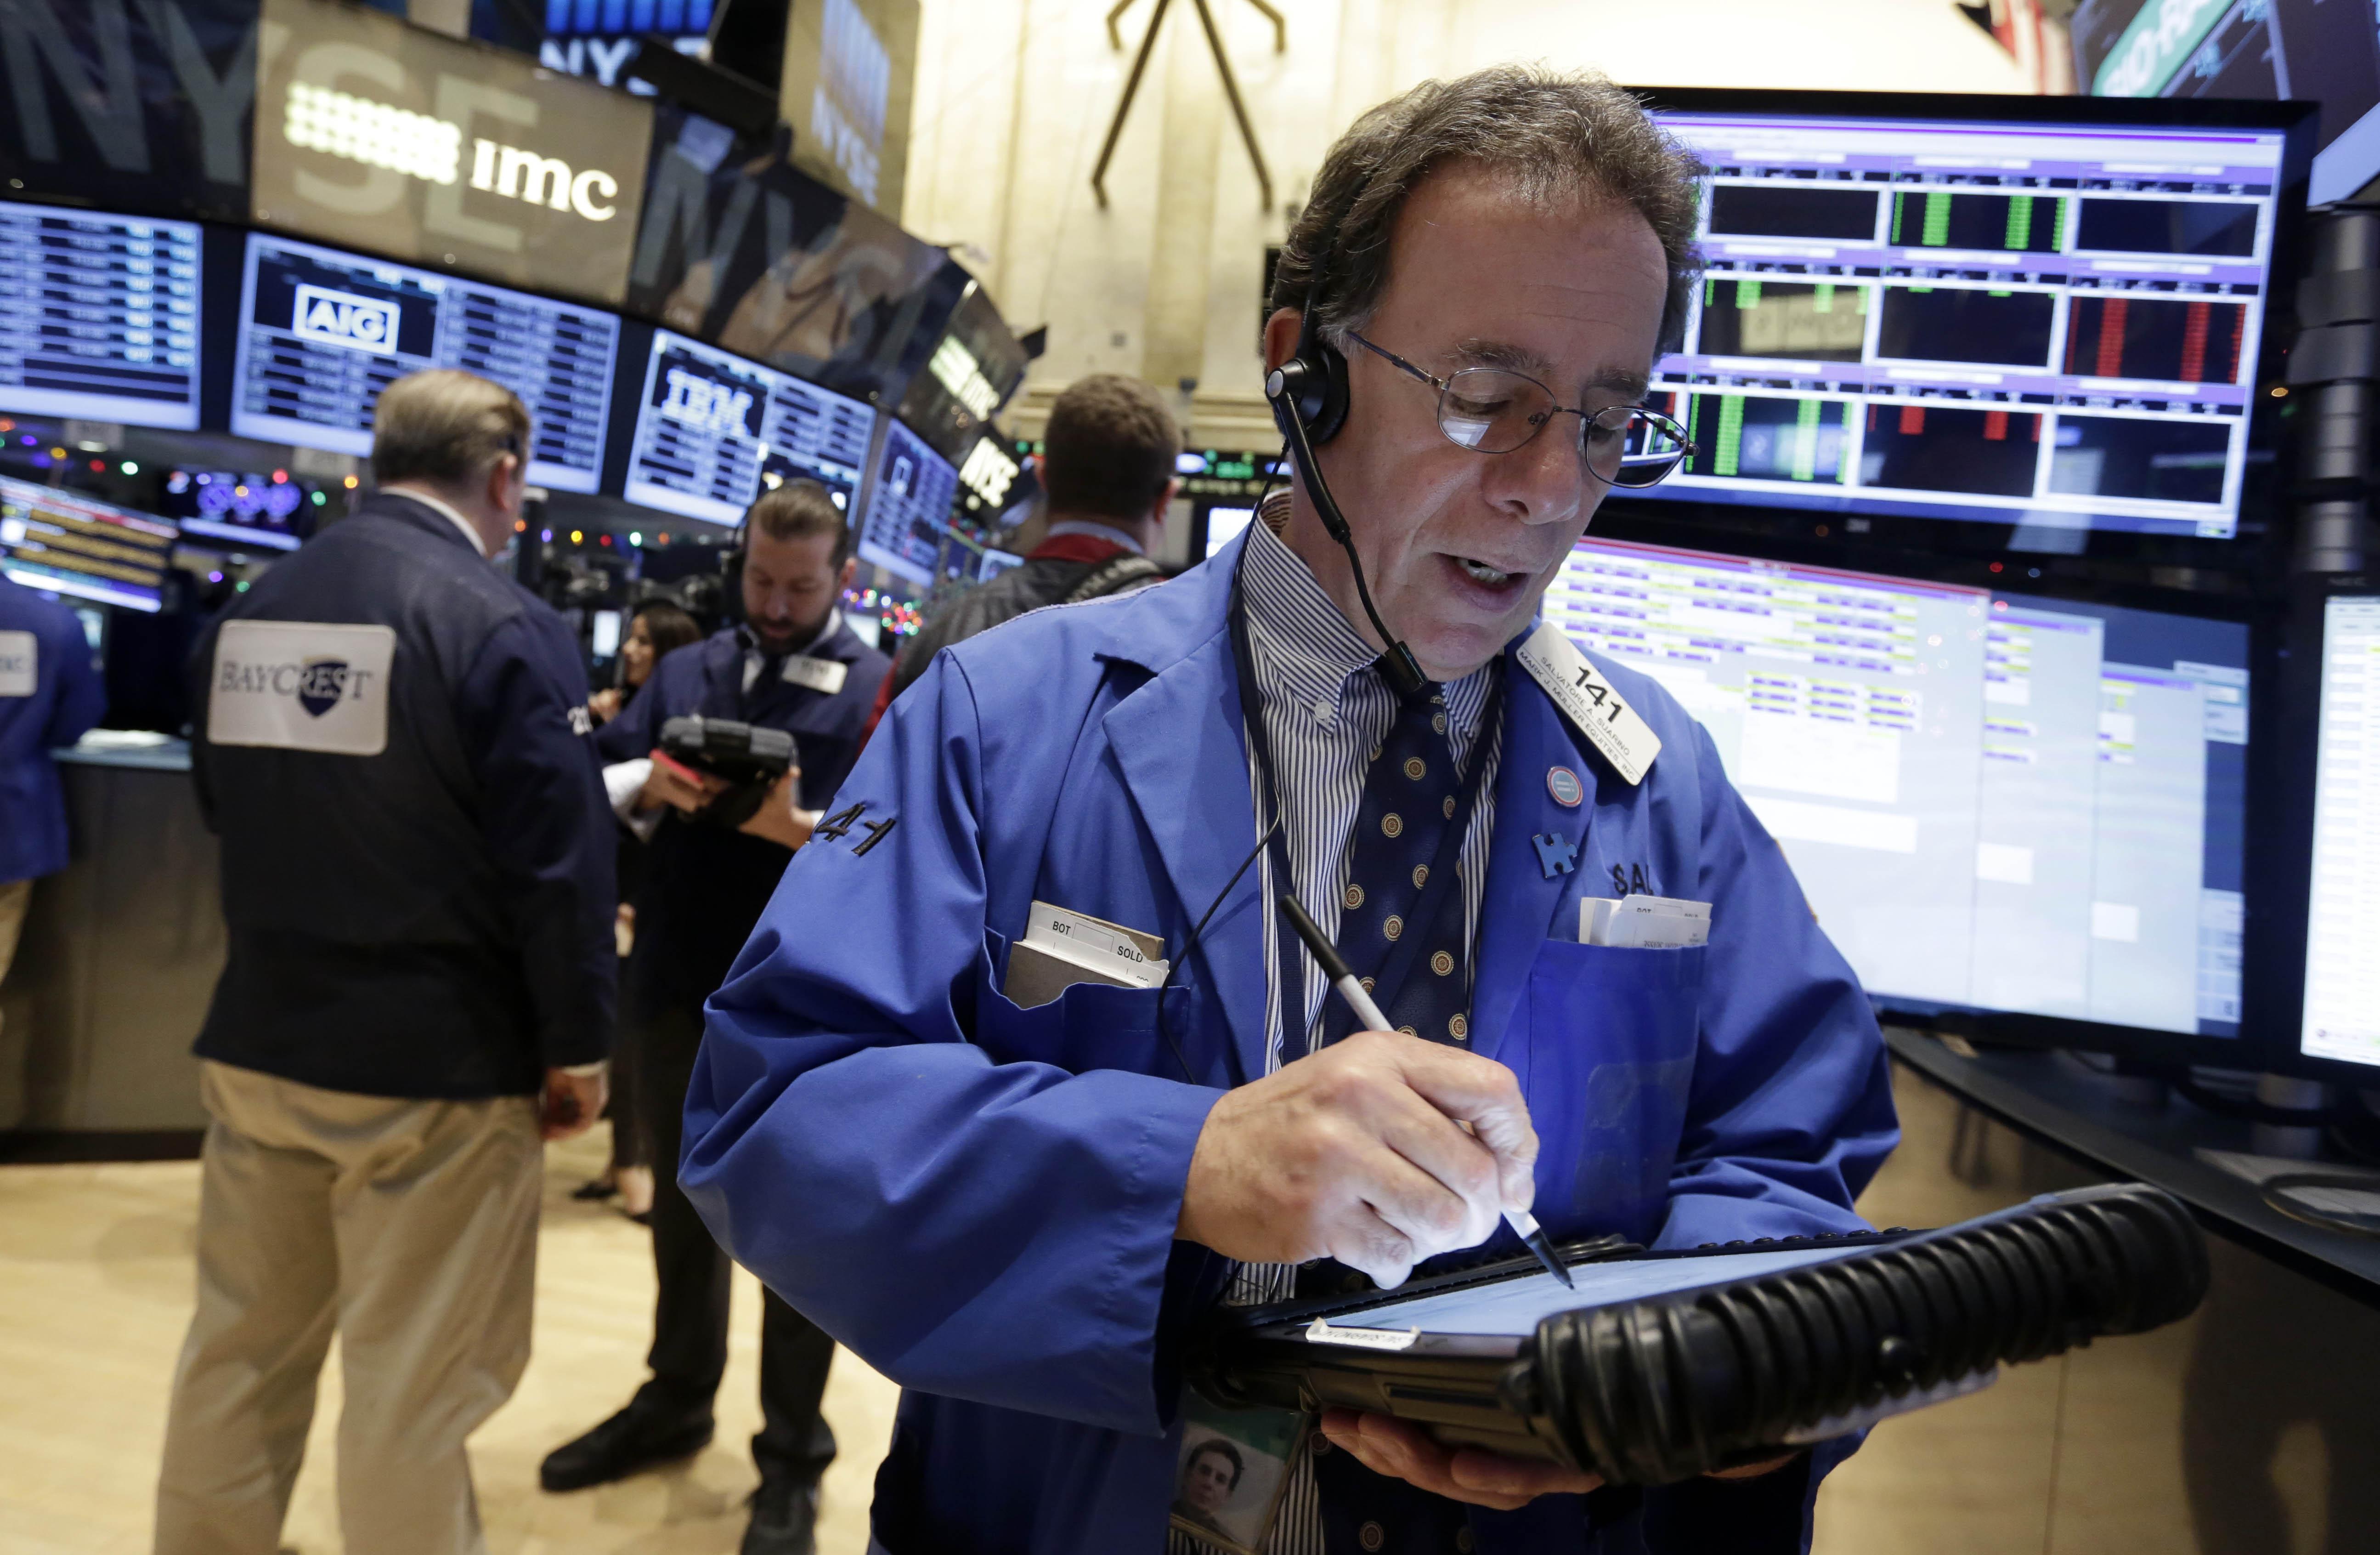 US stocks close mixed amid corporate earnings, economic data